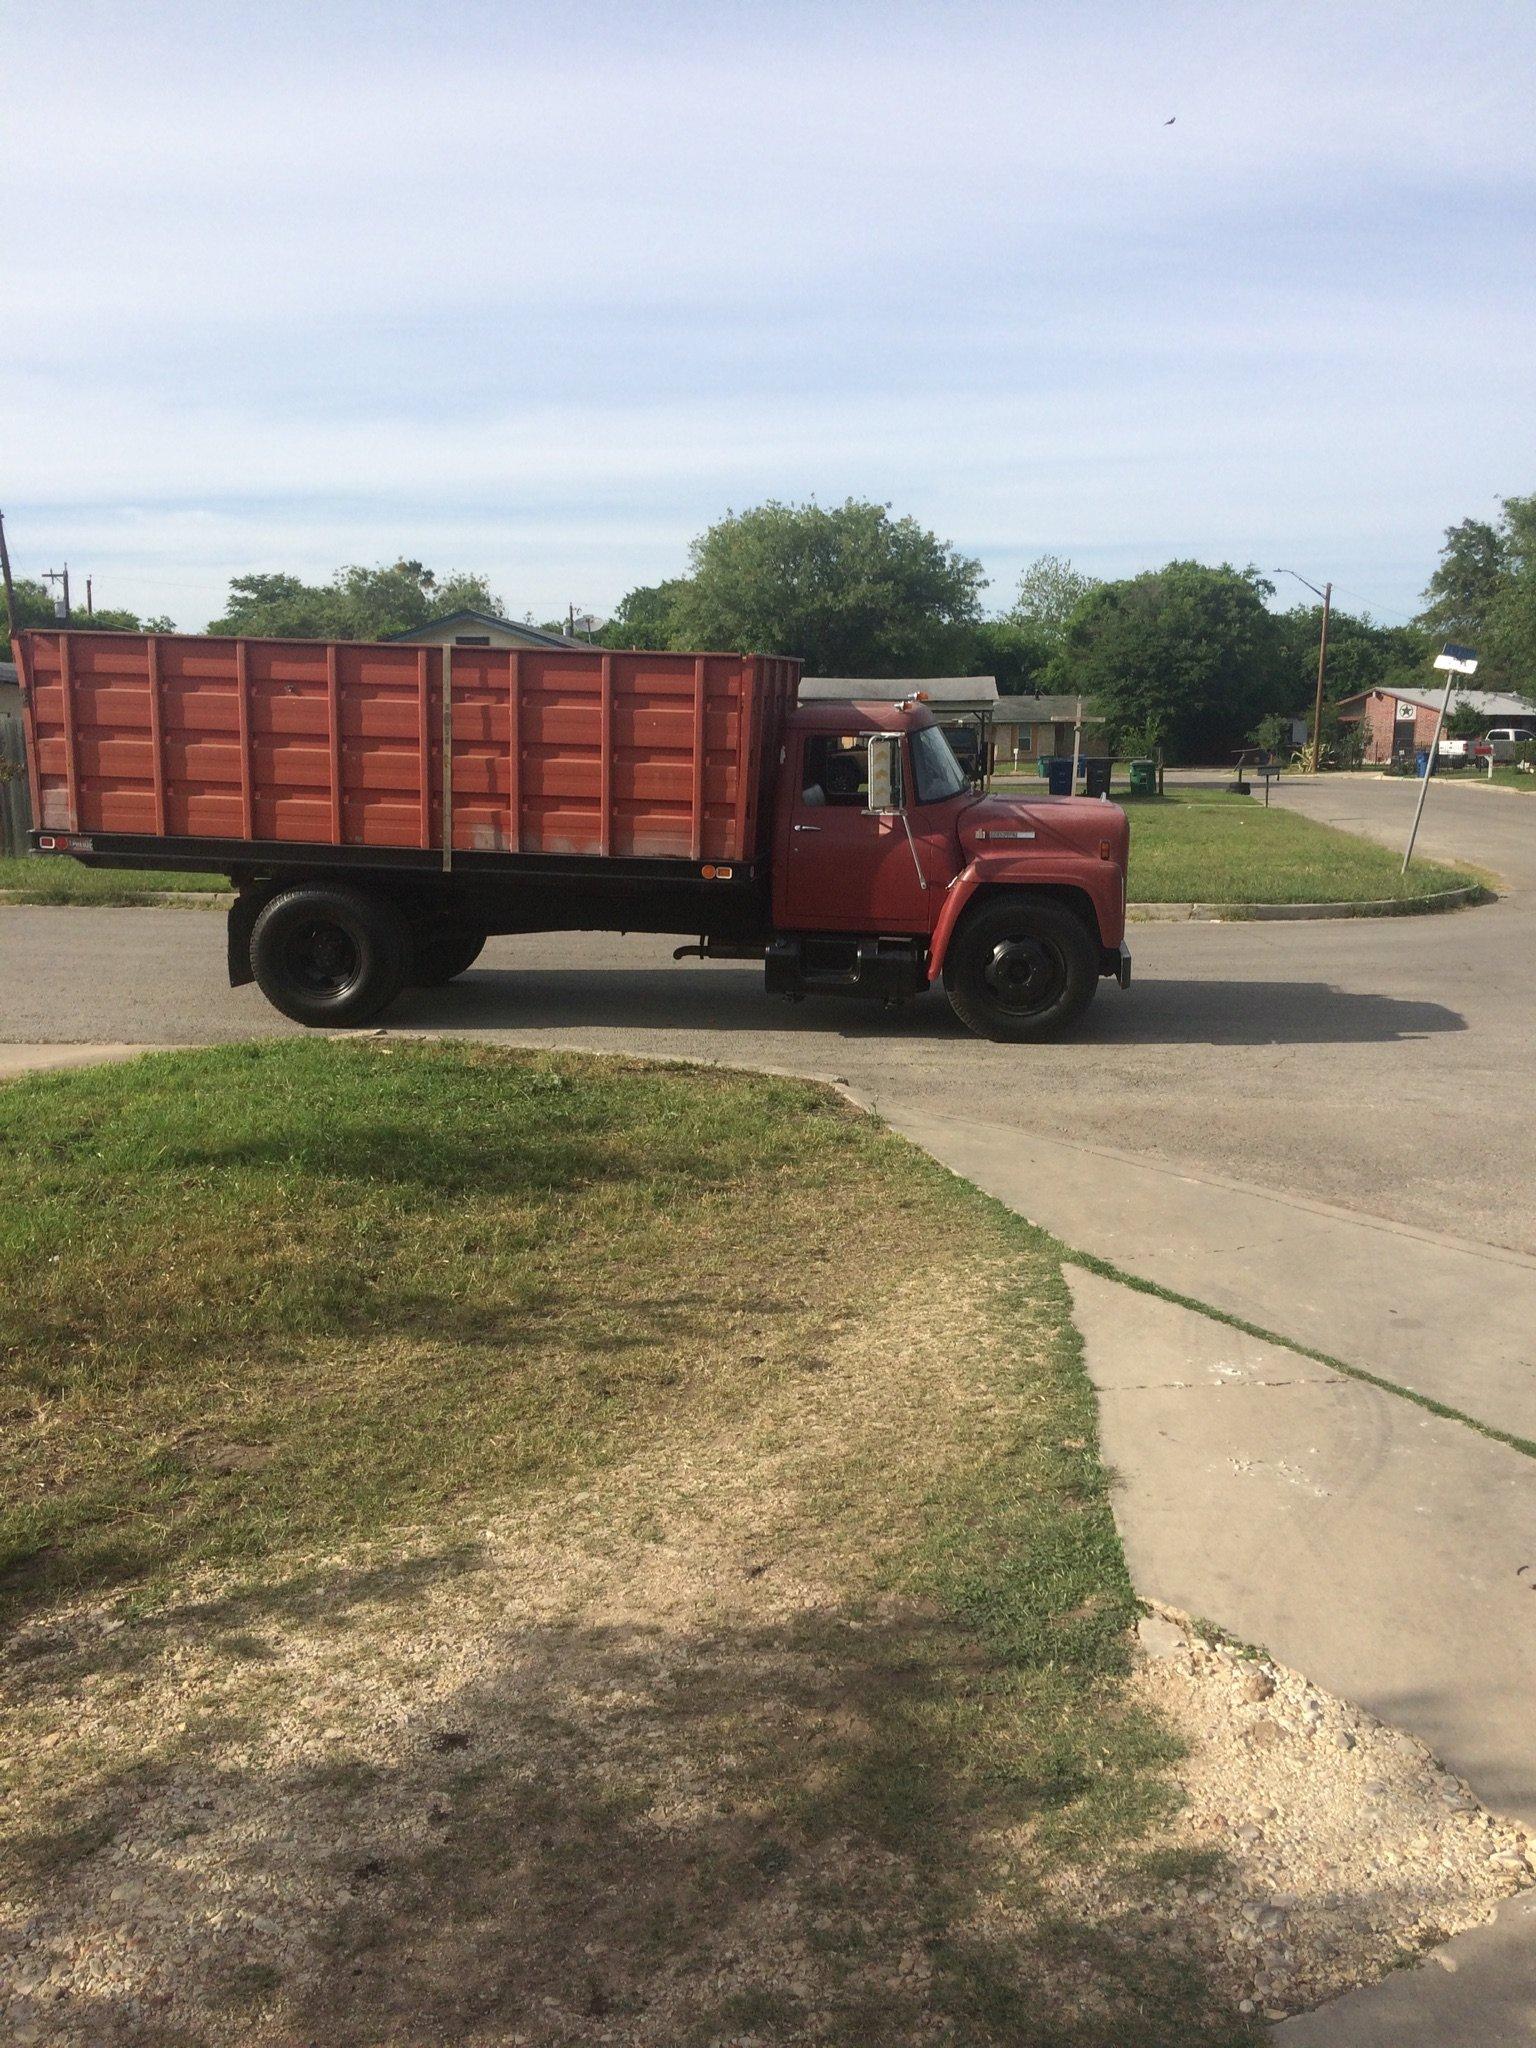 IH Loadstar 1600 brakes - IH Trucks - Red Power Magazine